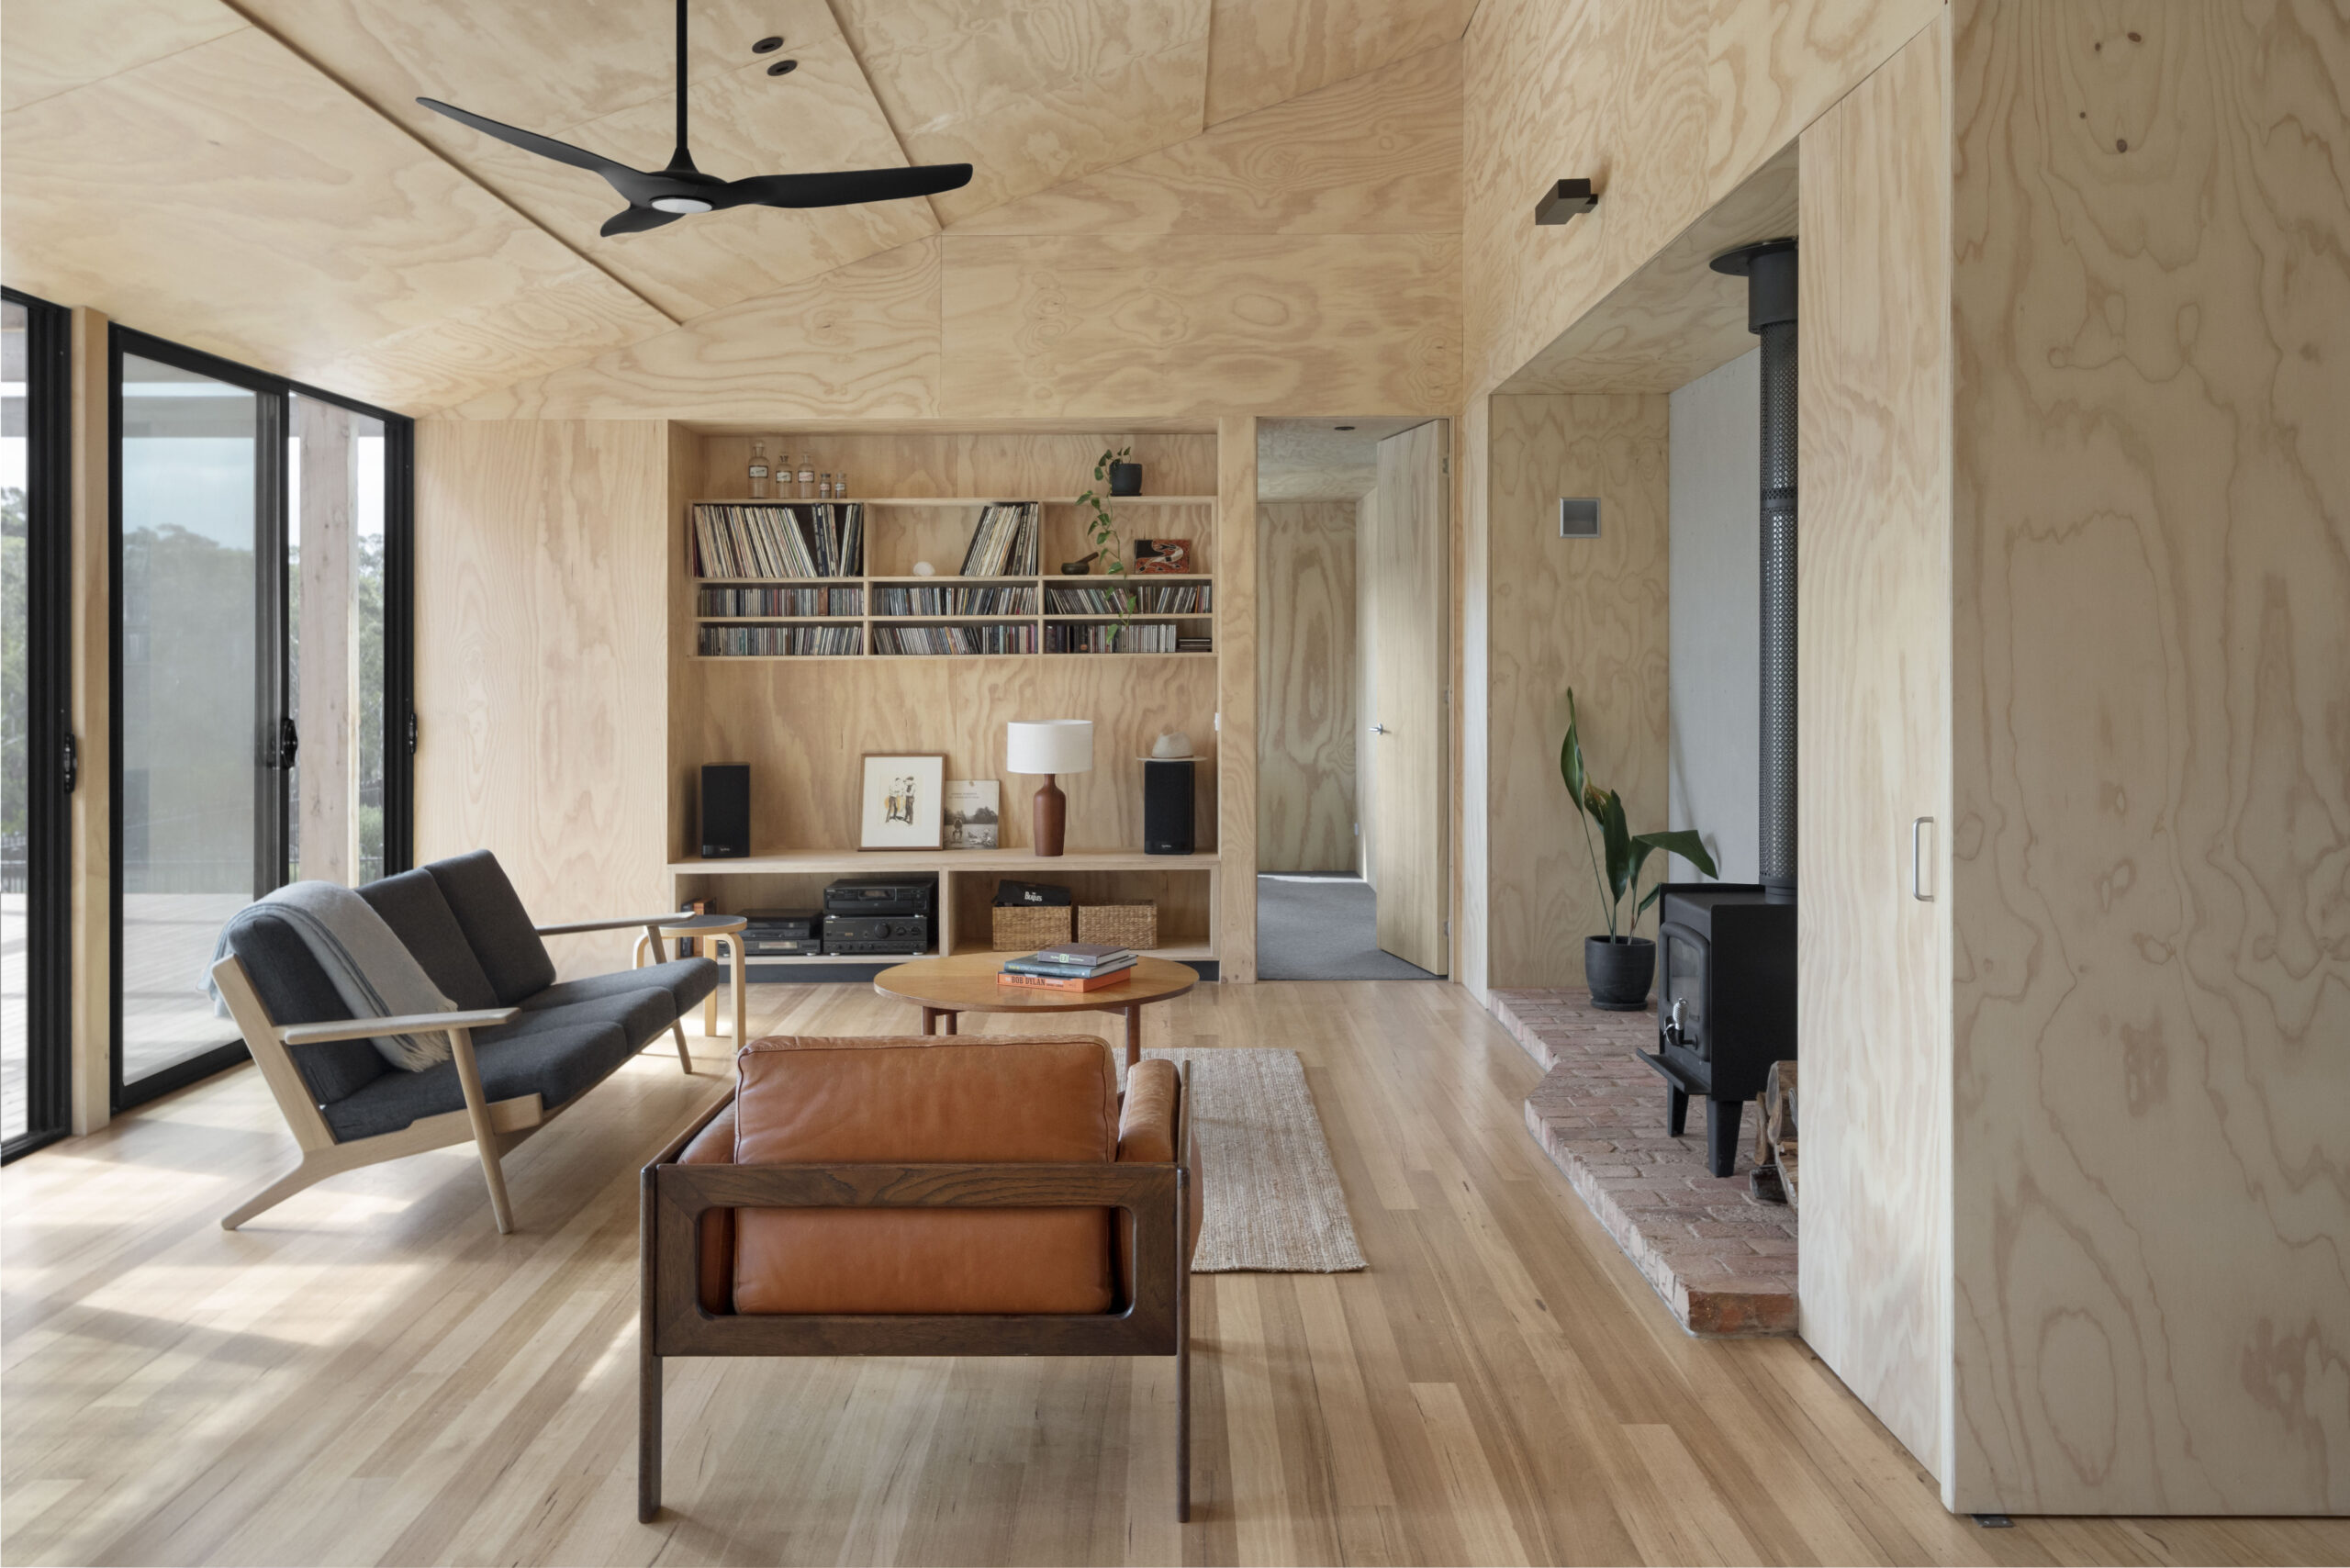 Créditos: Ben Hosking para Wiesebrock Architecture